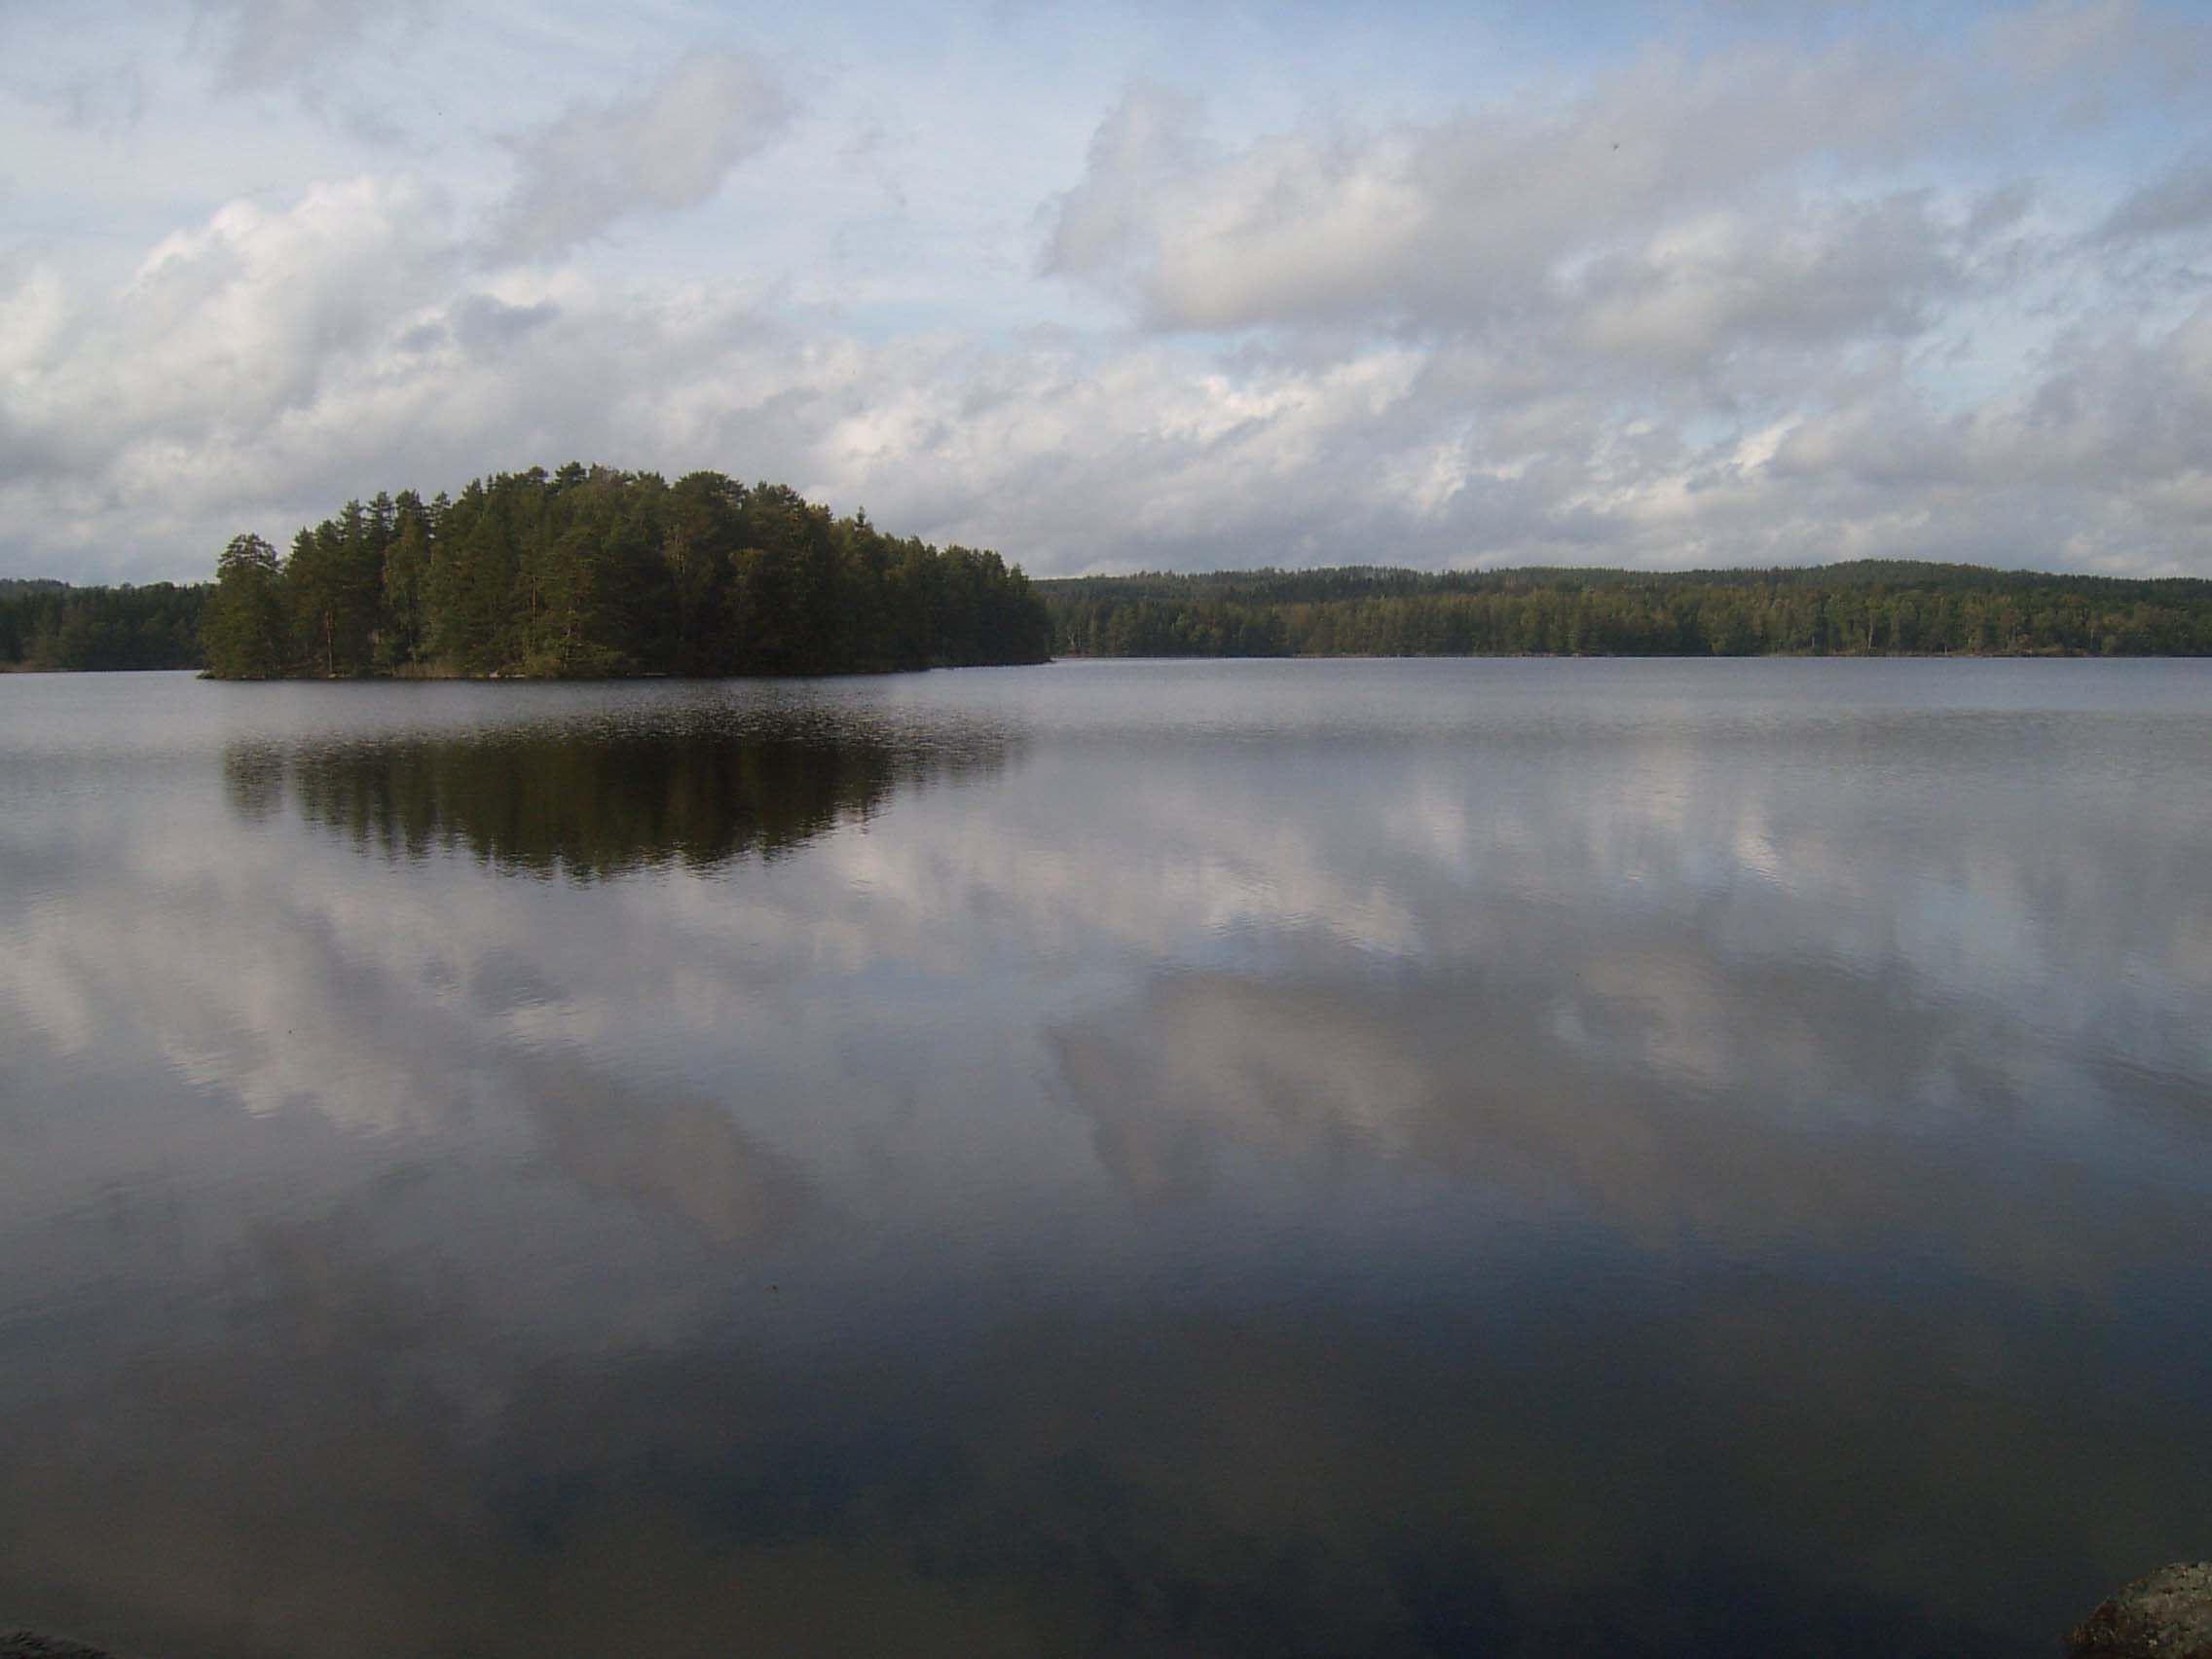 Virserumssjön, Virserum